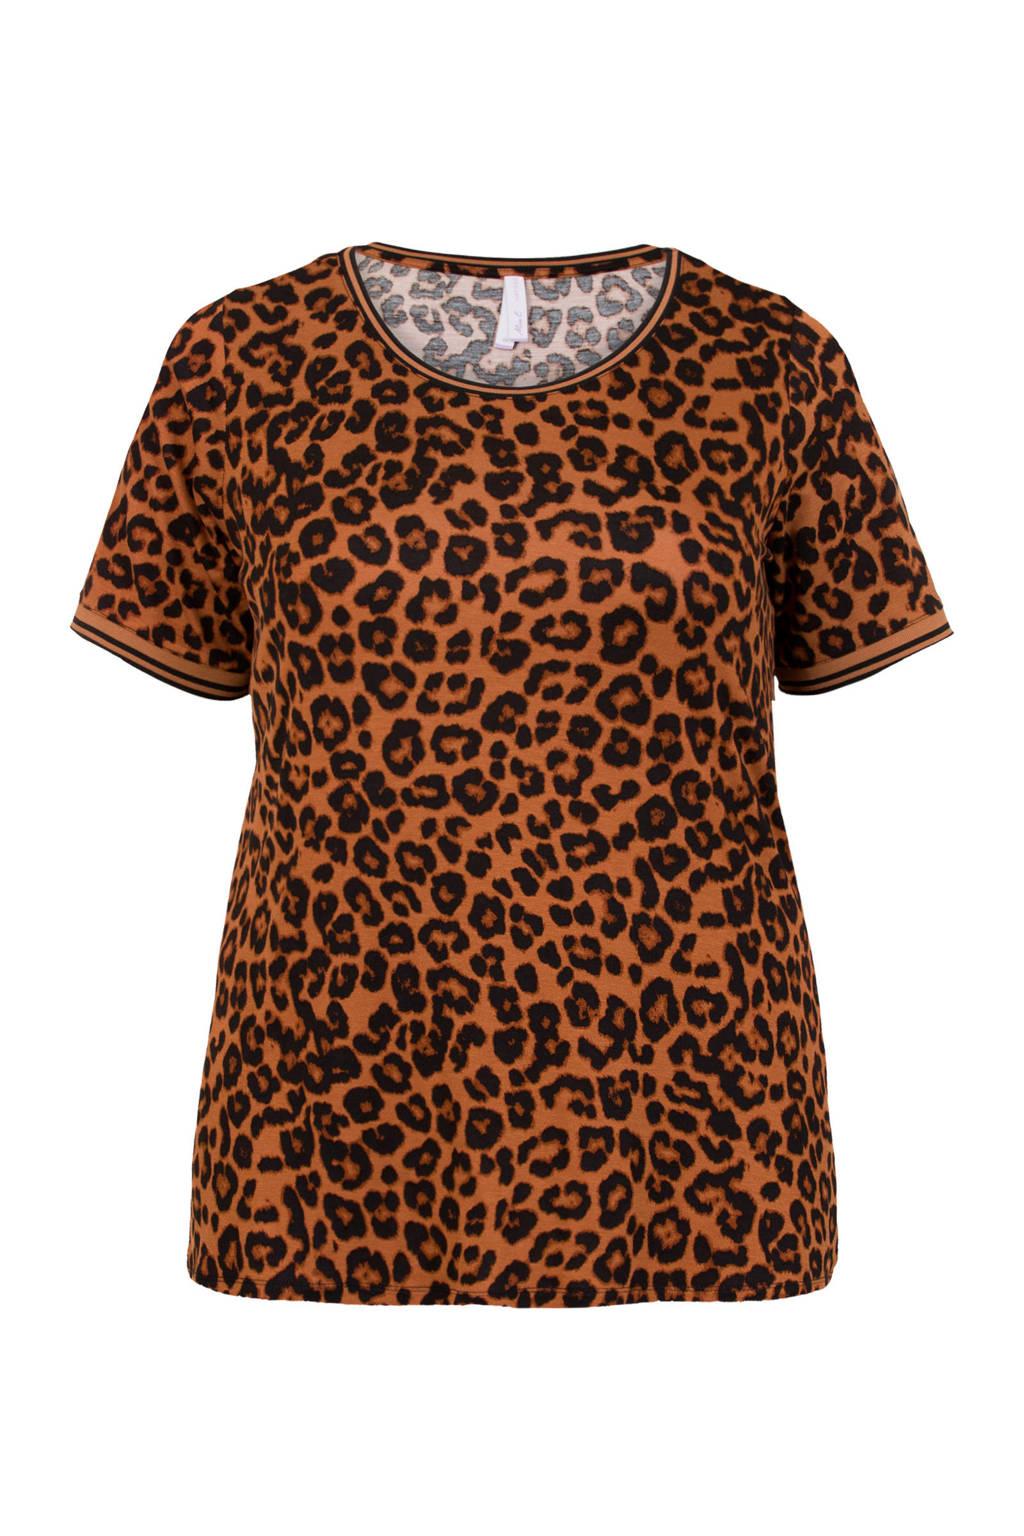 Miss Etam Plus T-shirt met all over print bruin, Bruin